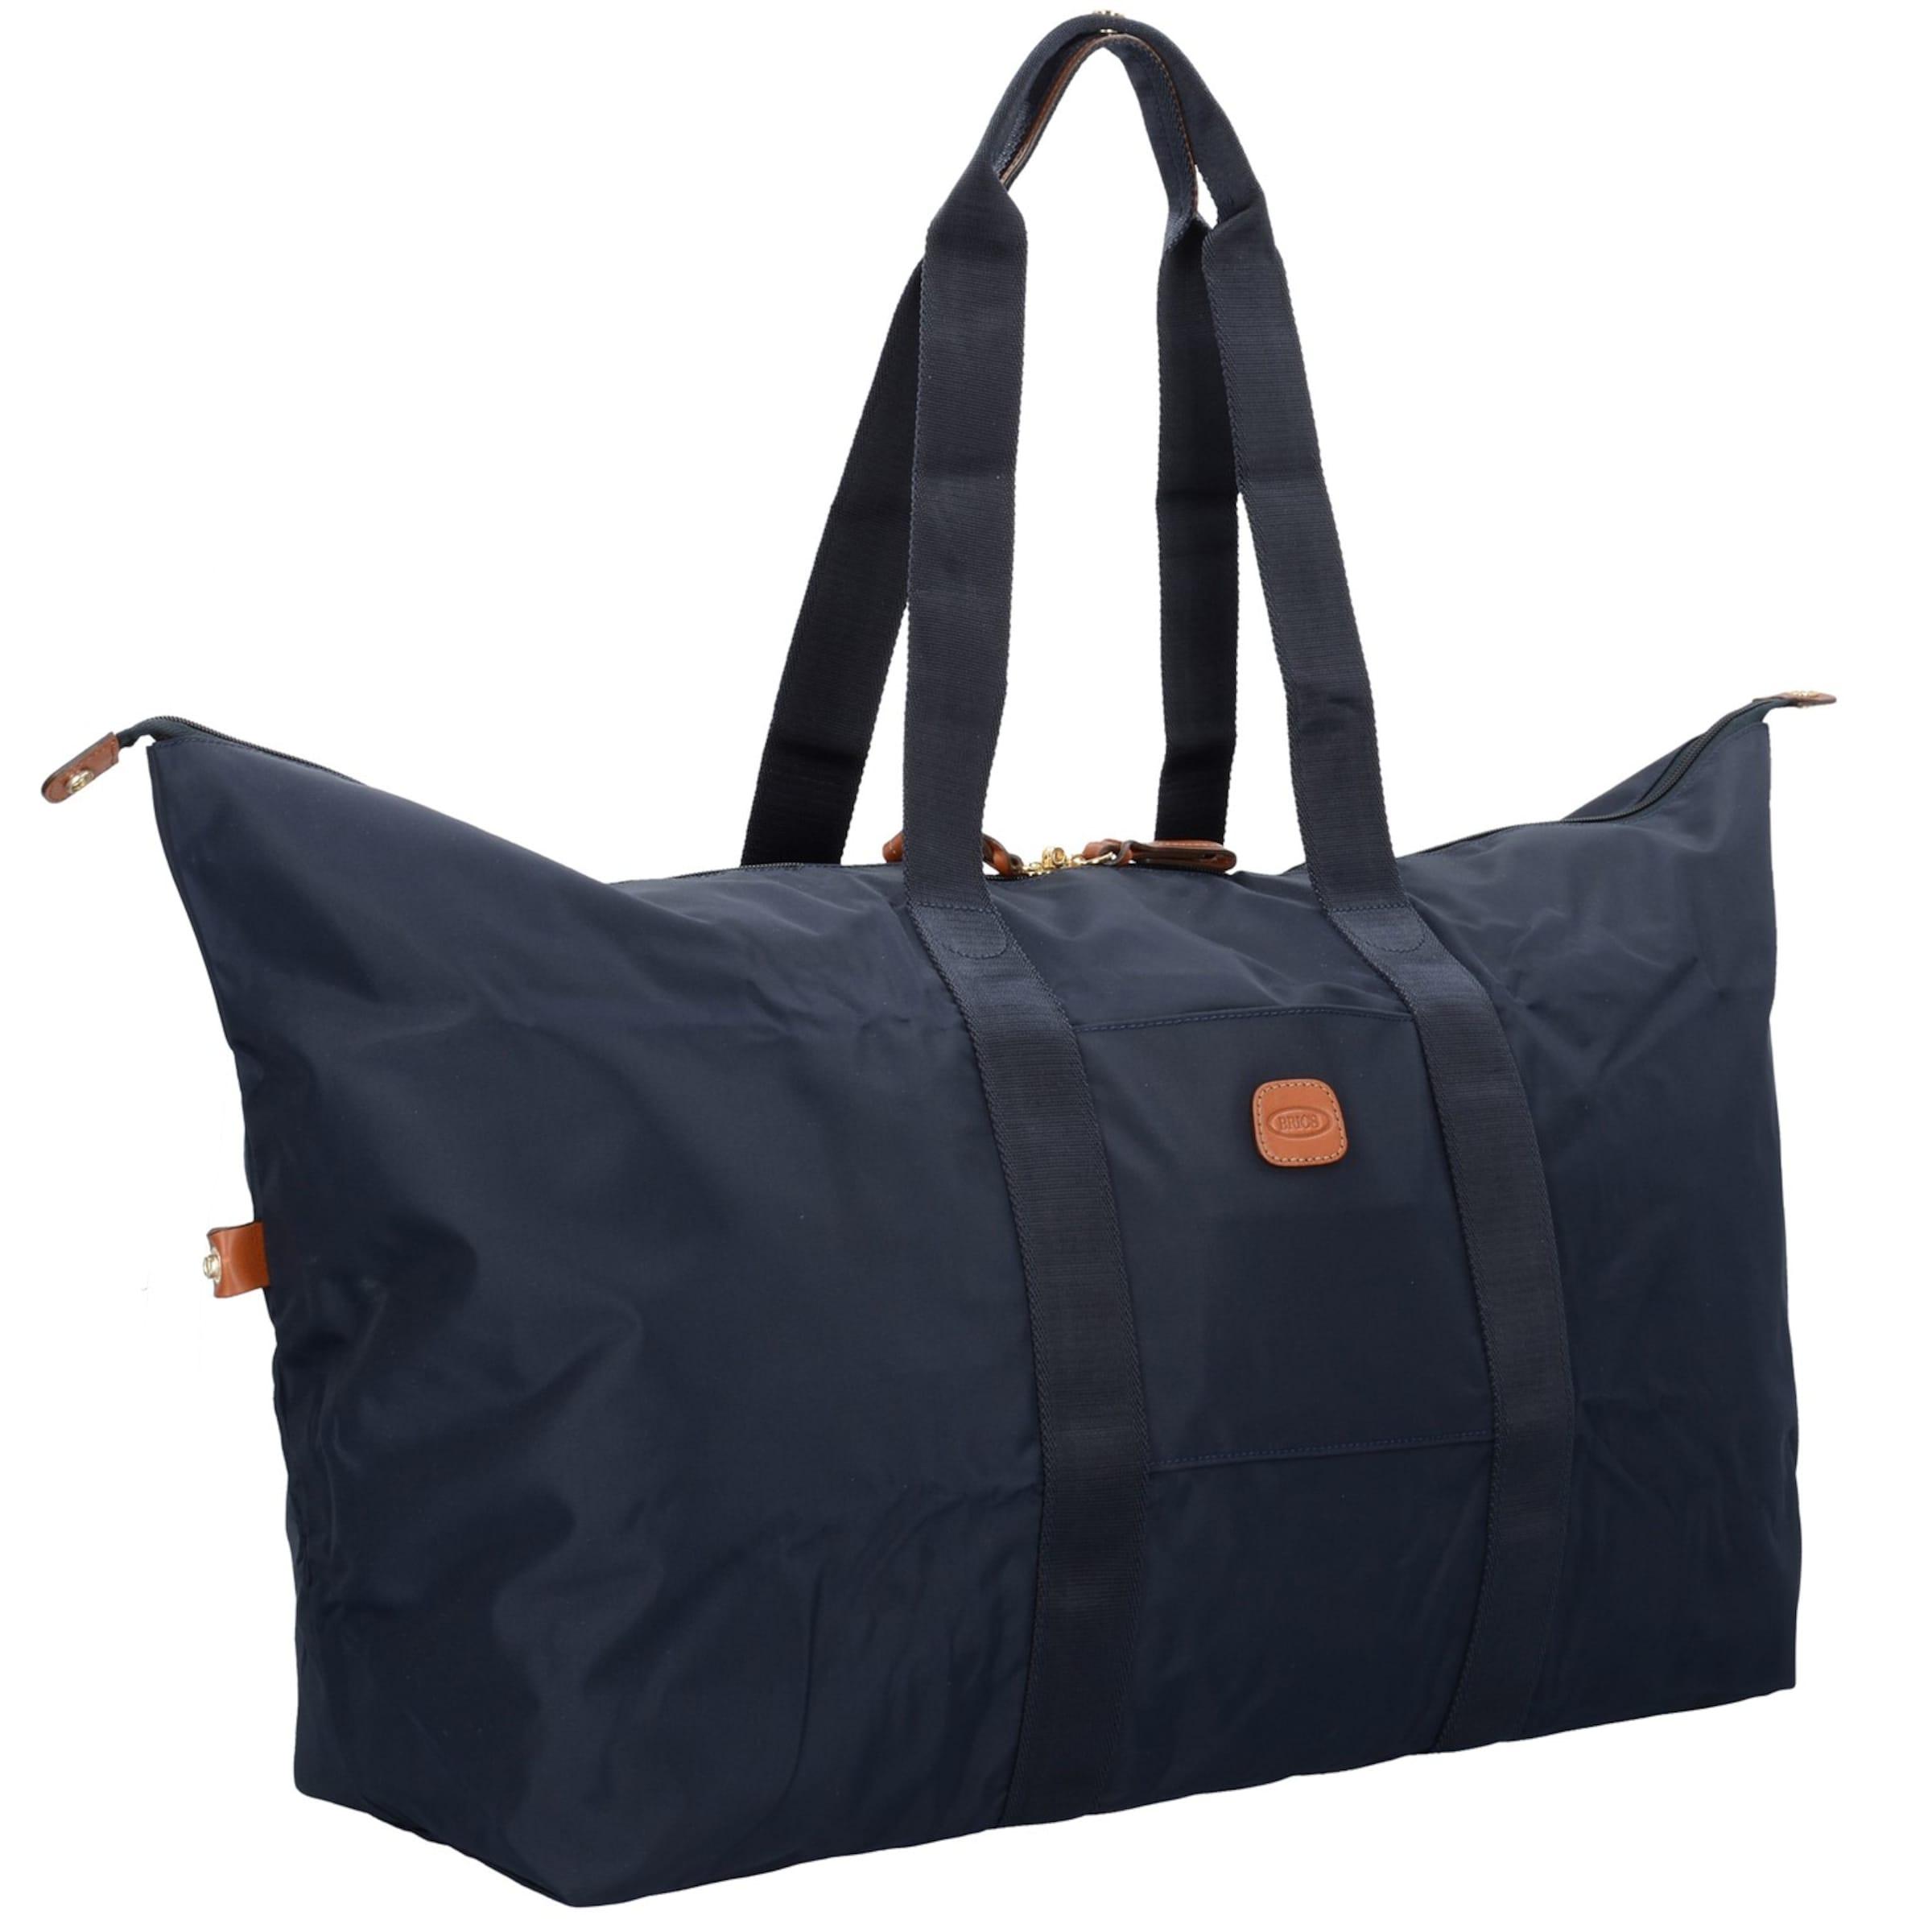 cm 55 X Bric's Bag cm X Reisetasche Reisetasche Bric's Bag X Bric's 55 77rqxO6n